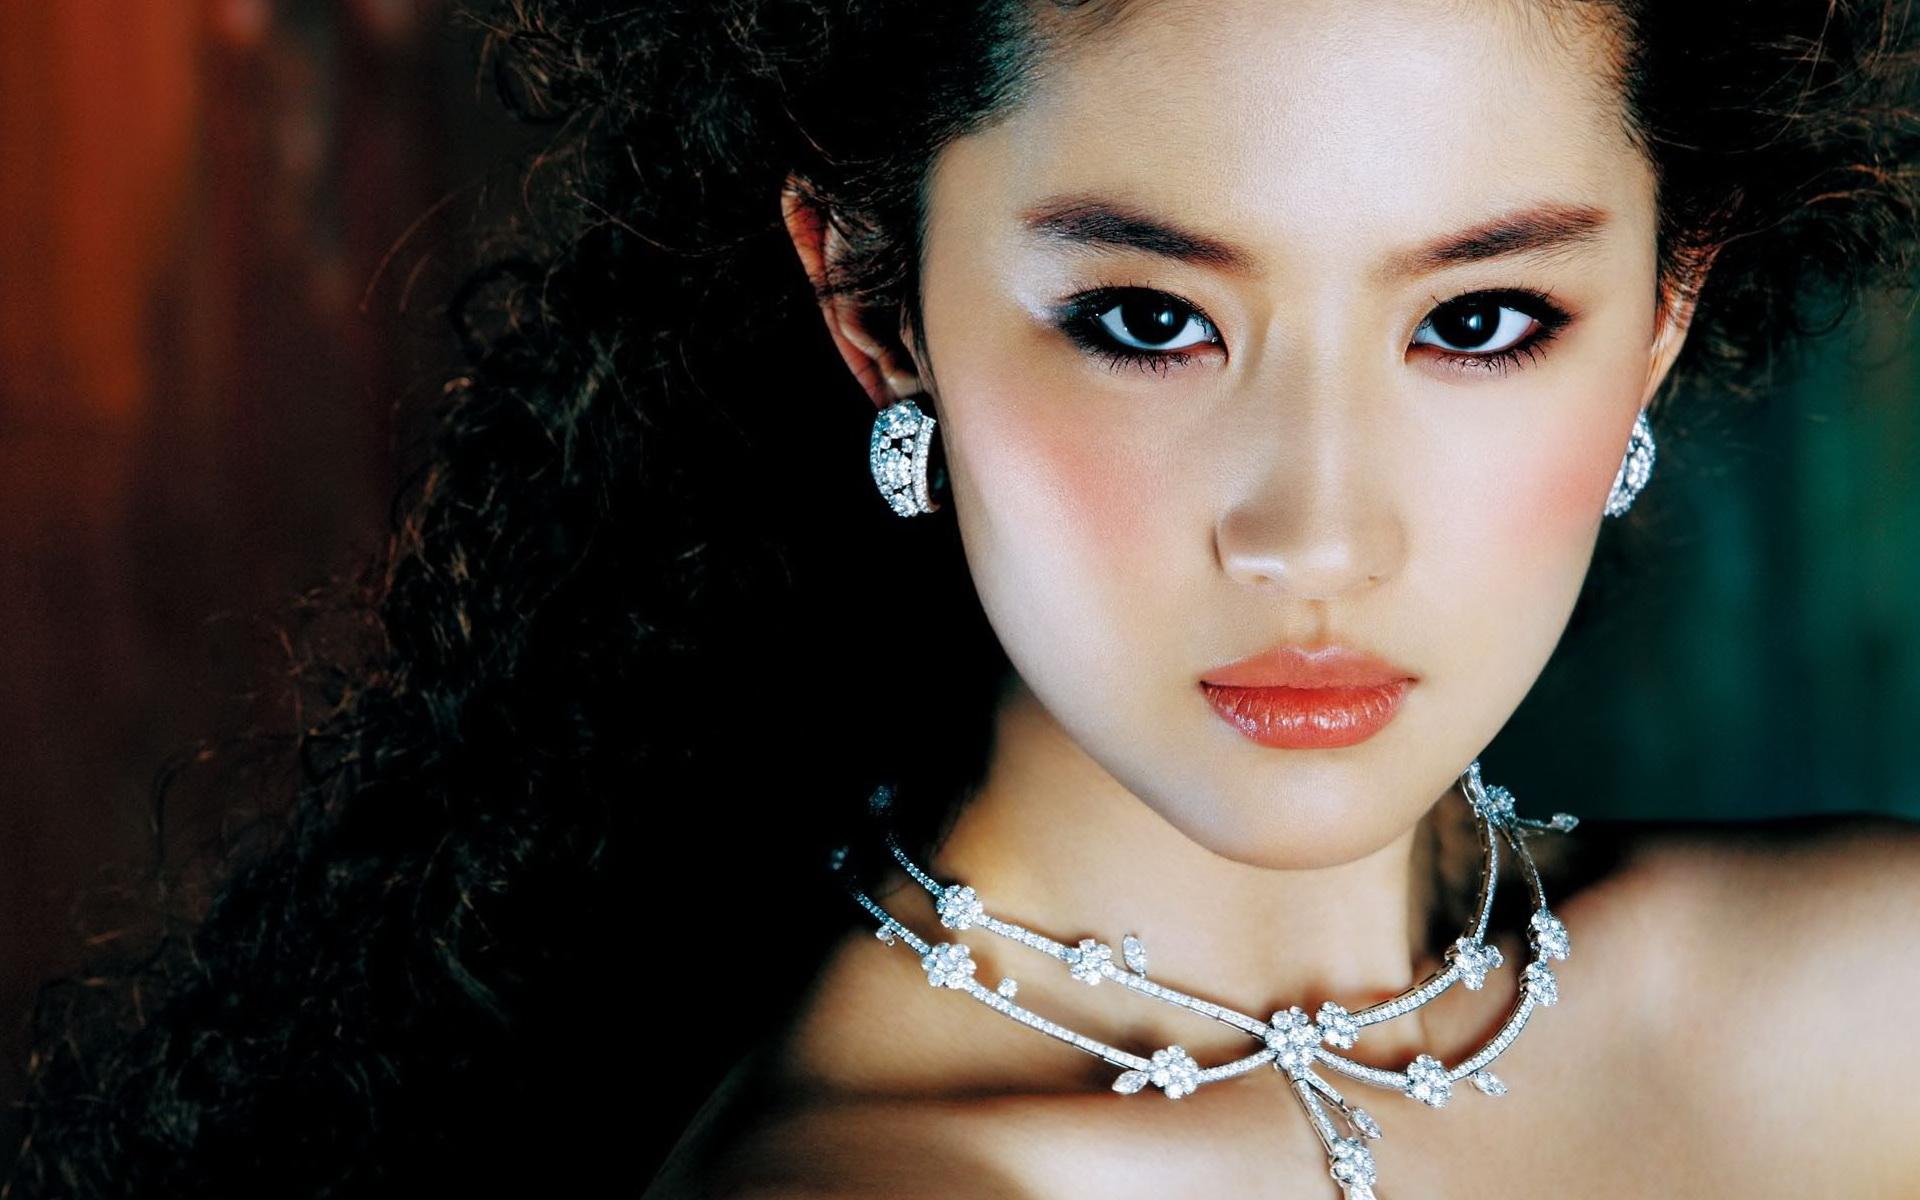 Description: Beautiful Girl Wallpapers HD is a hi res Wallpaper for pc